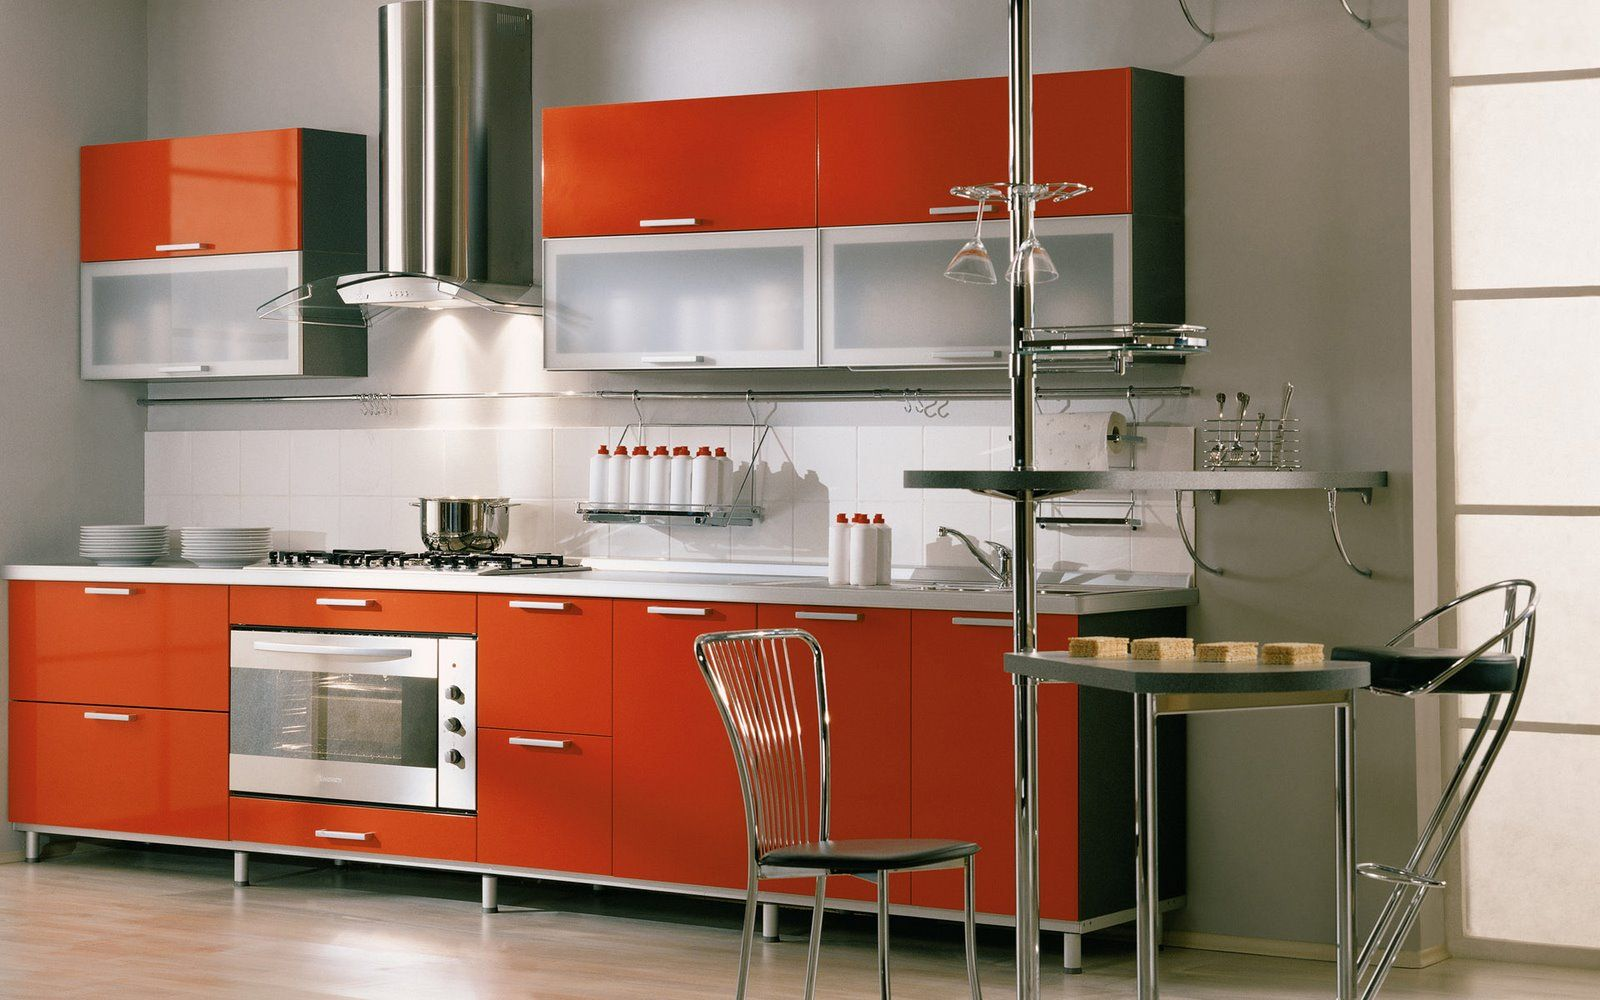 Orange And White Kitchen Ideas Part - 27: Innovative Small Modular Kitchen Decor Inspirations : Impressive Grey Small  Modular Kitchen Design With Orange Kitchen Cabinets And White Ceramic Tiles  ...